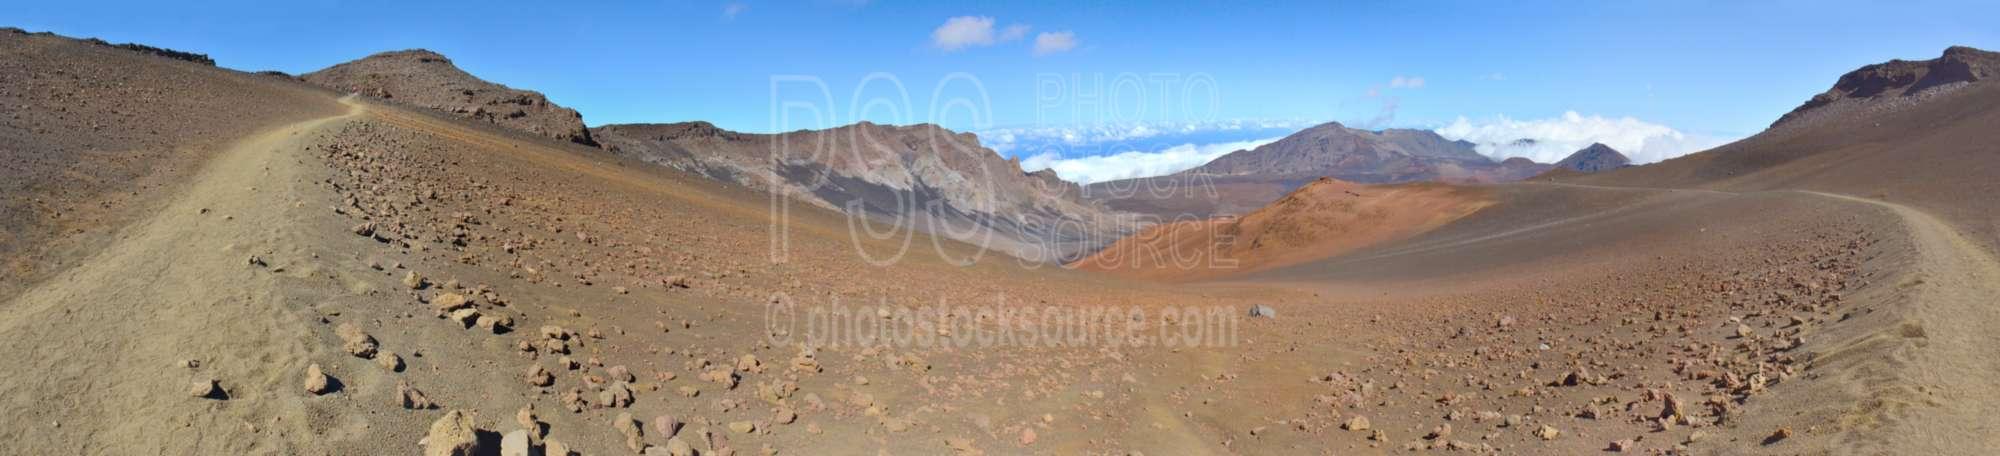 Haleakala Crater Trails